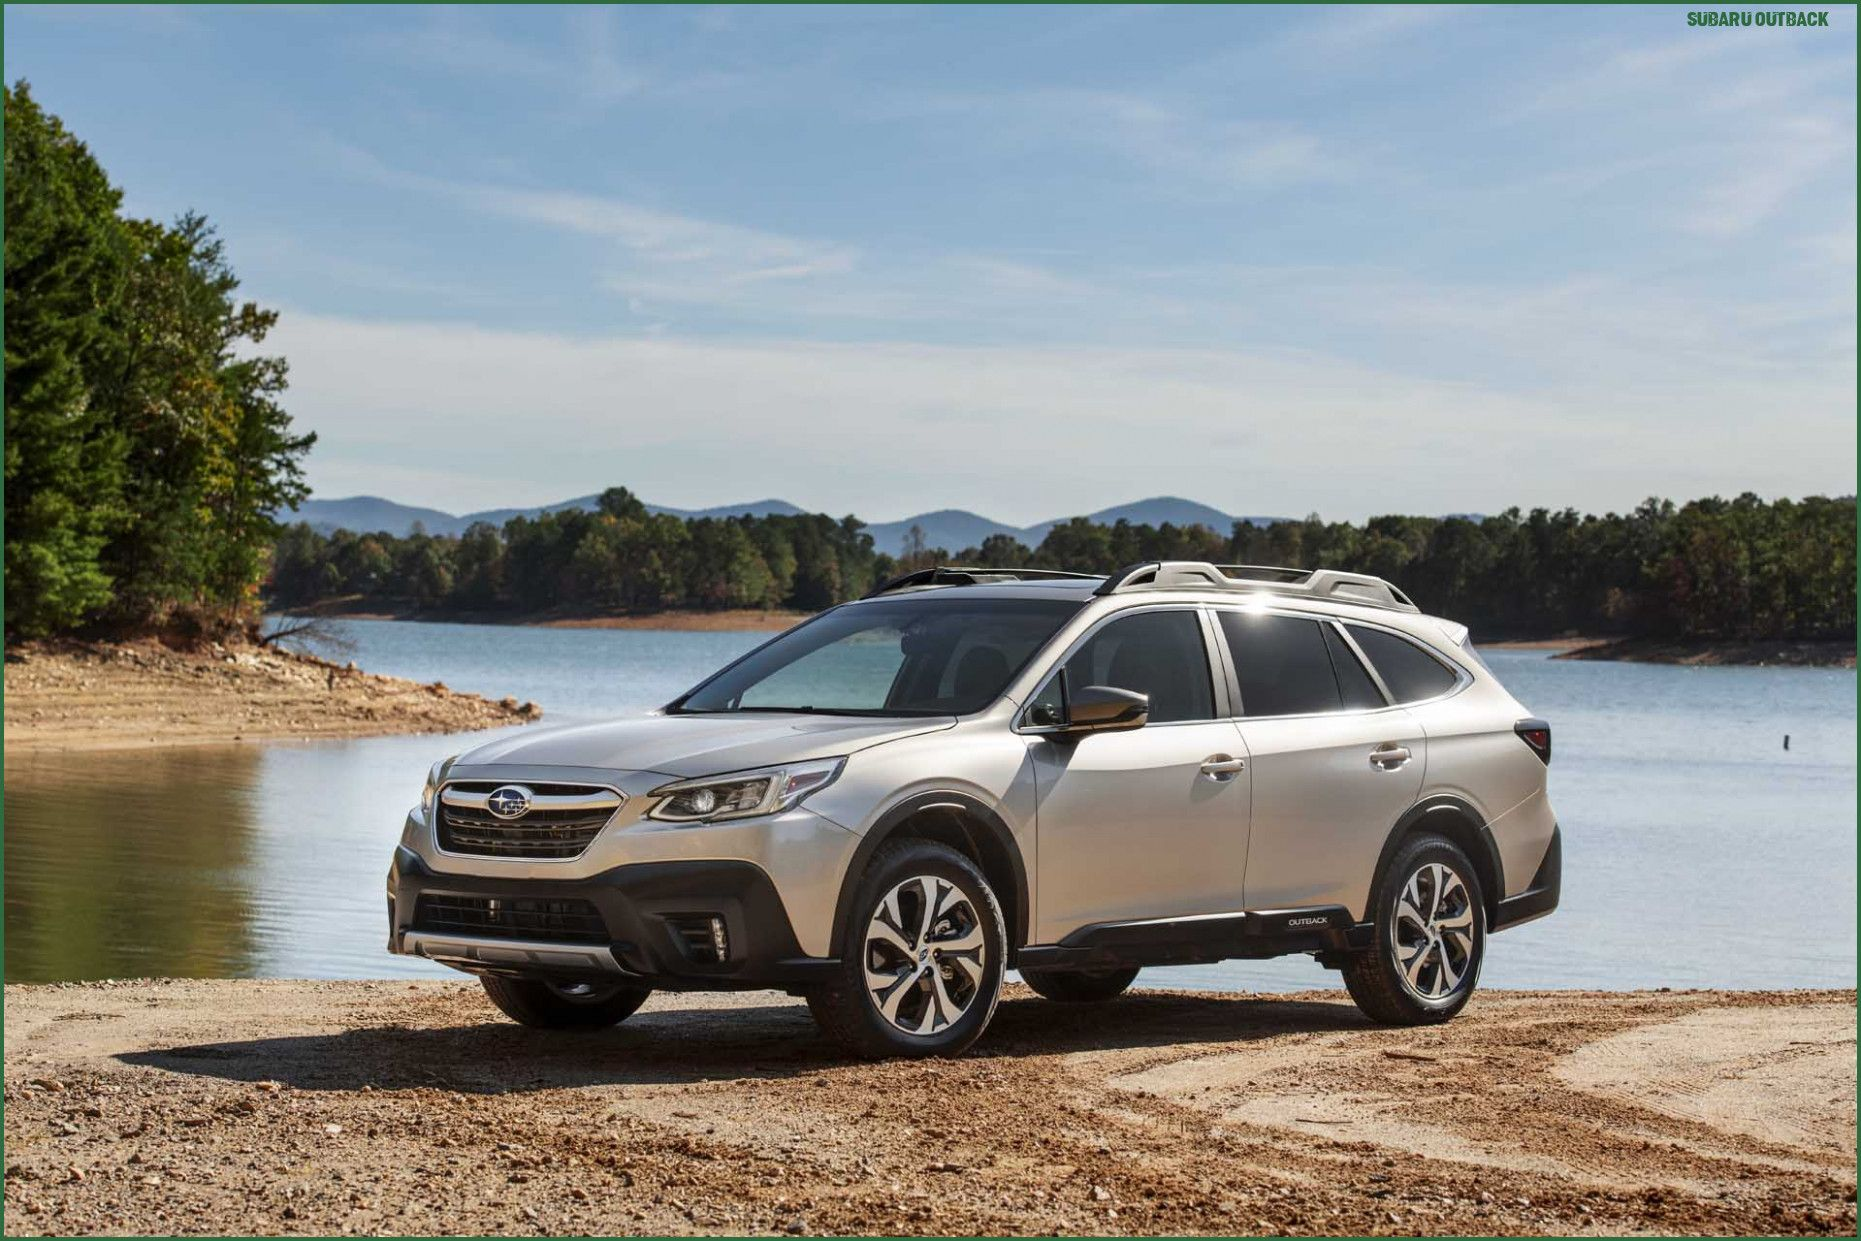 Never Underestimate The Influence Of Subaru Outback Subaru Outback In 2020 Subaru Outback Subaru Sporty Suv